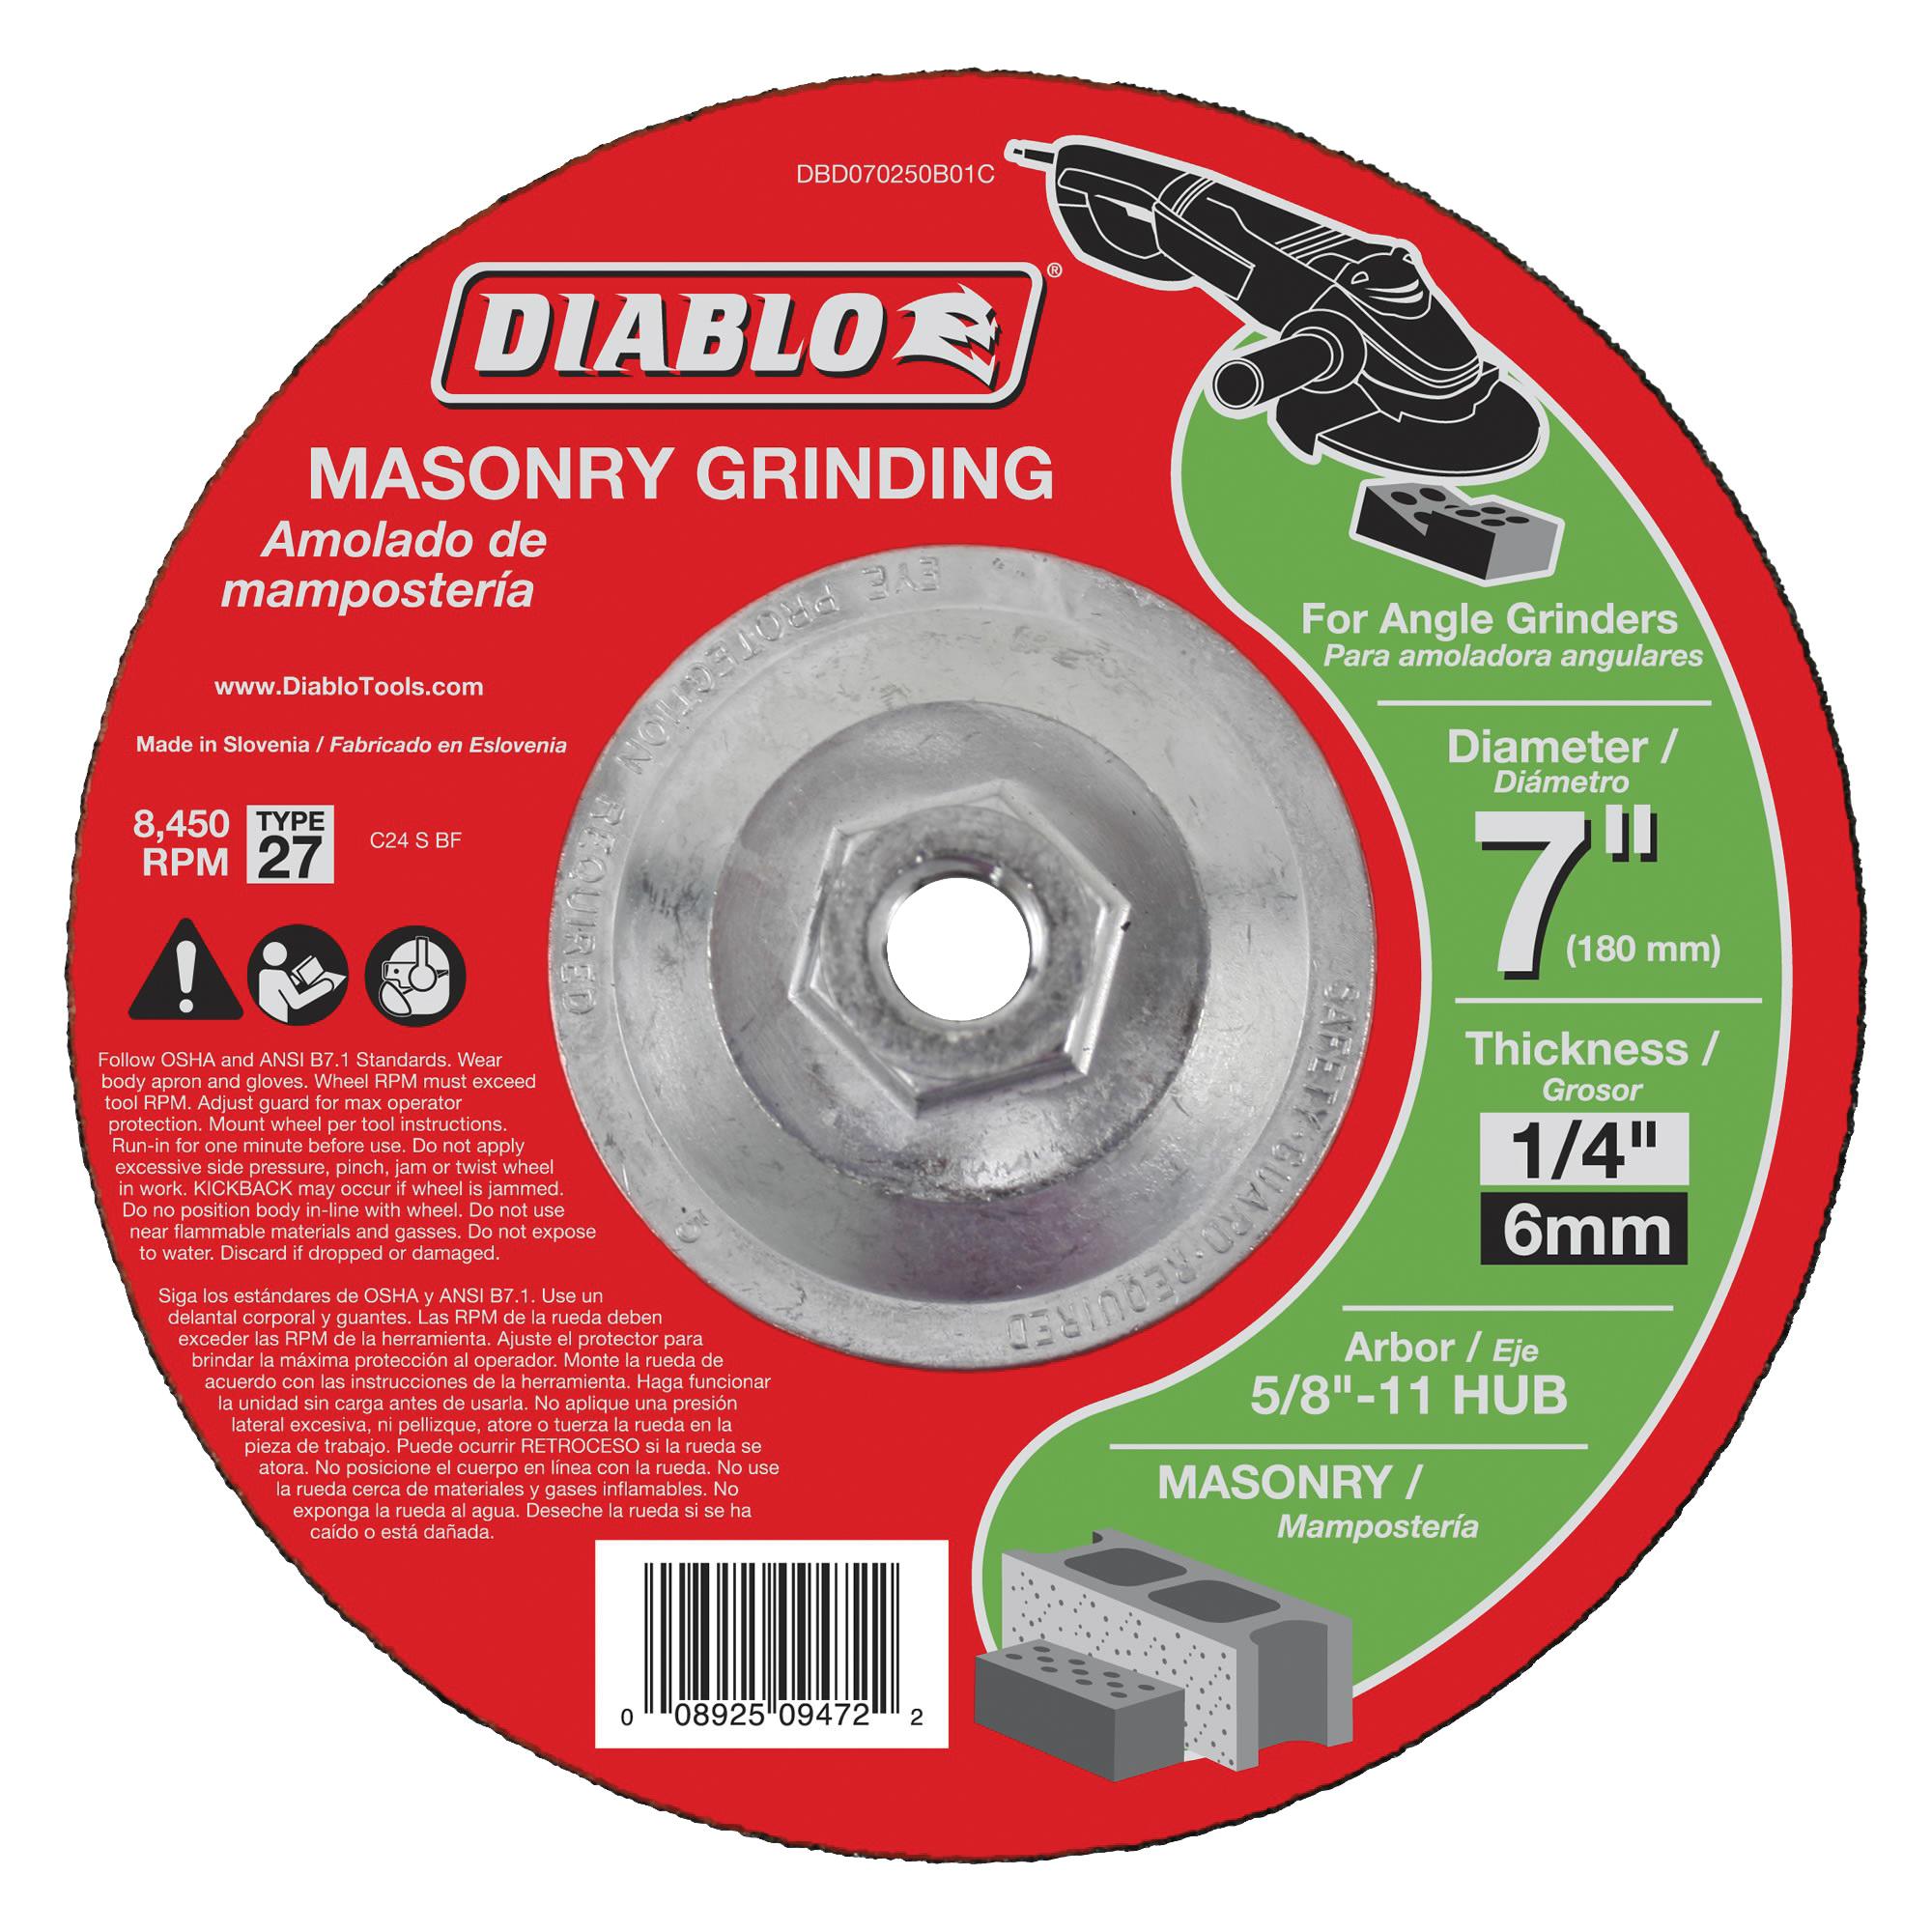 Picture of Diablo DBD070250B01C Grinding Wheel, 7 in Dia, 1/4 in Thick, 5/8-11 in Arbor, Aluminum Oxide Abrasive